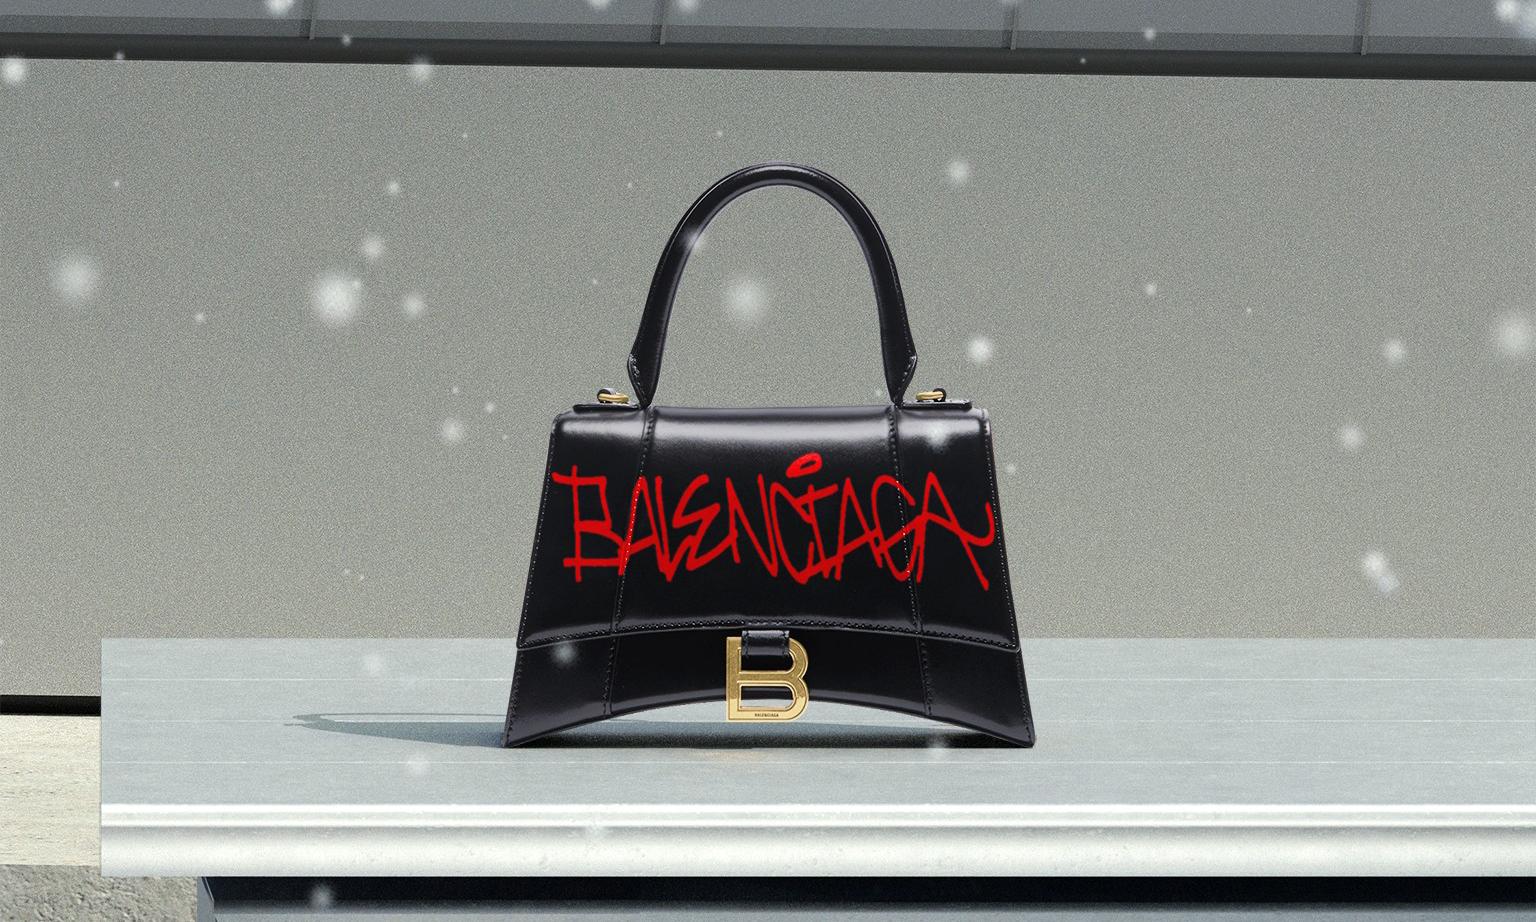 Balenciaga 即将为中国消费者推出现场手袋定制服务